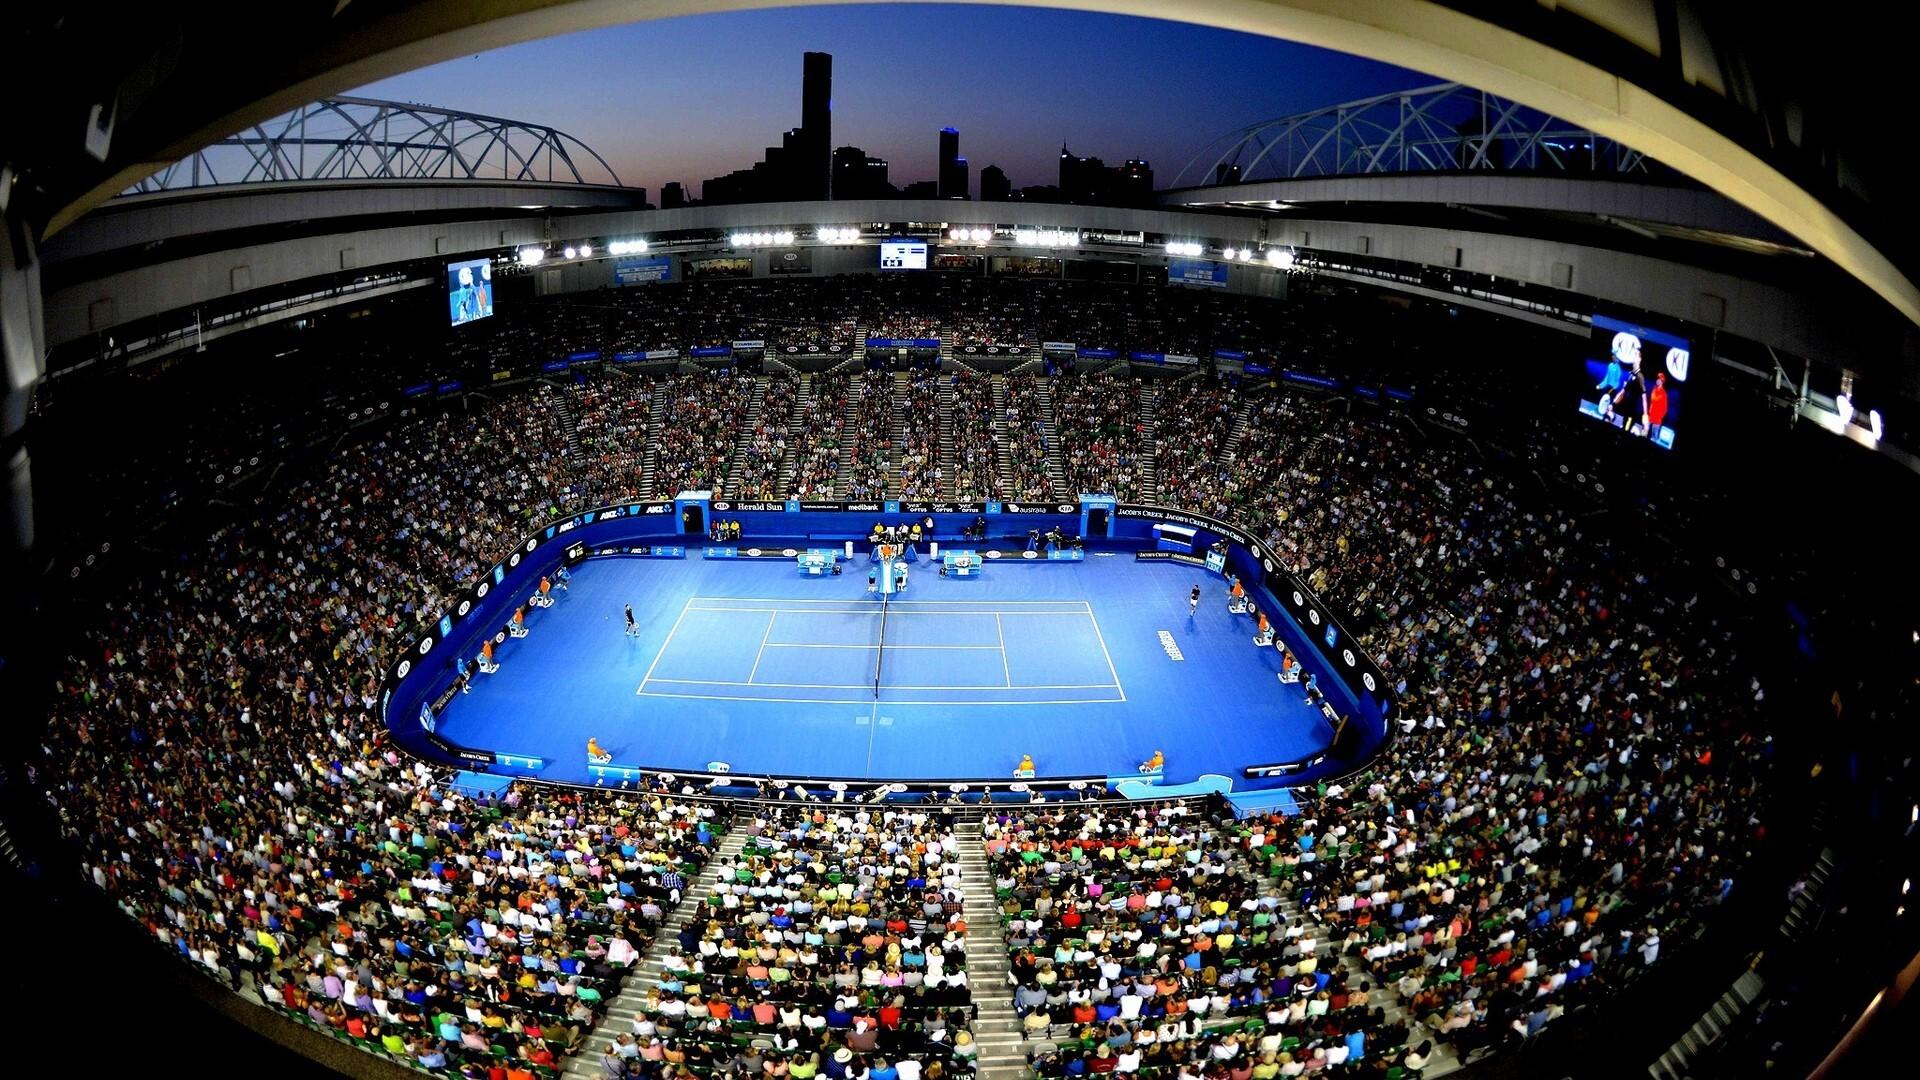 Amazing Tennis Sport Game Stadium Wallpapers